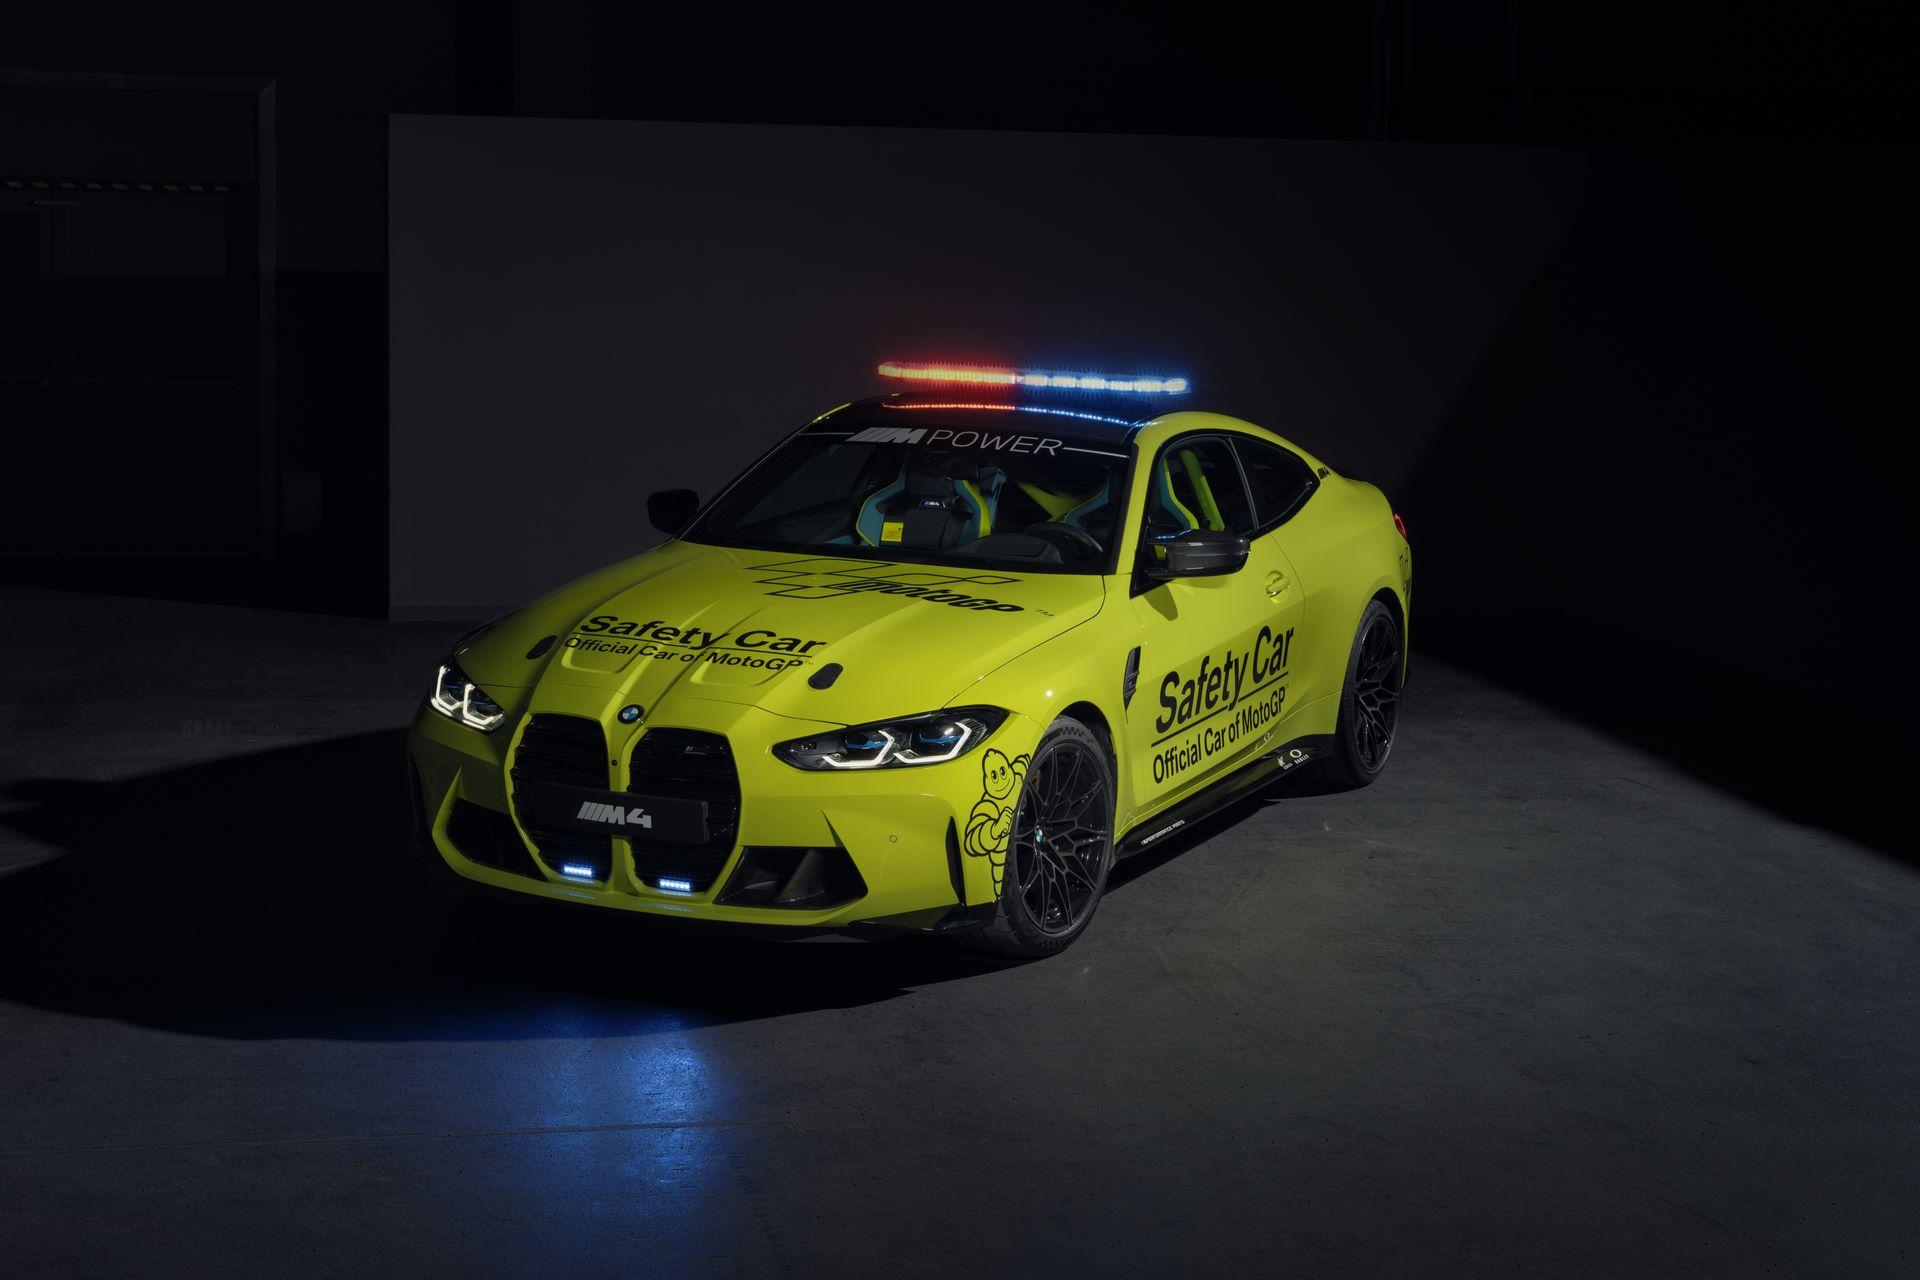 BMW-M3-M4-M5-CS-Safety-Cars-moto-gp-motogp-8